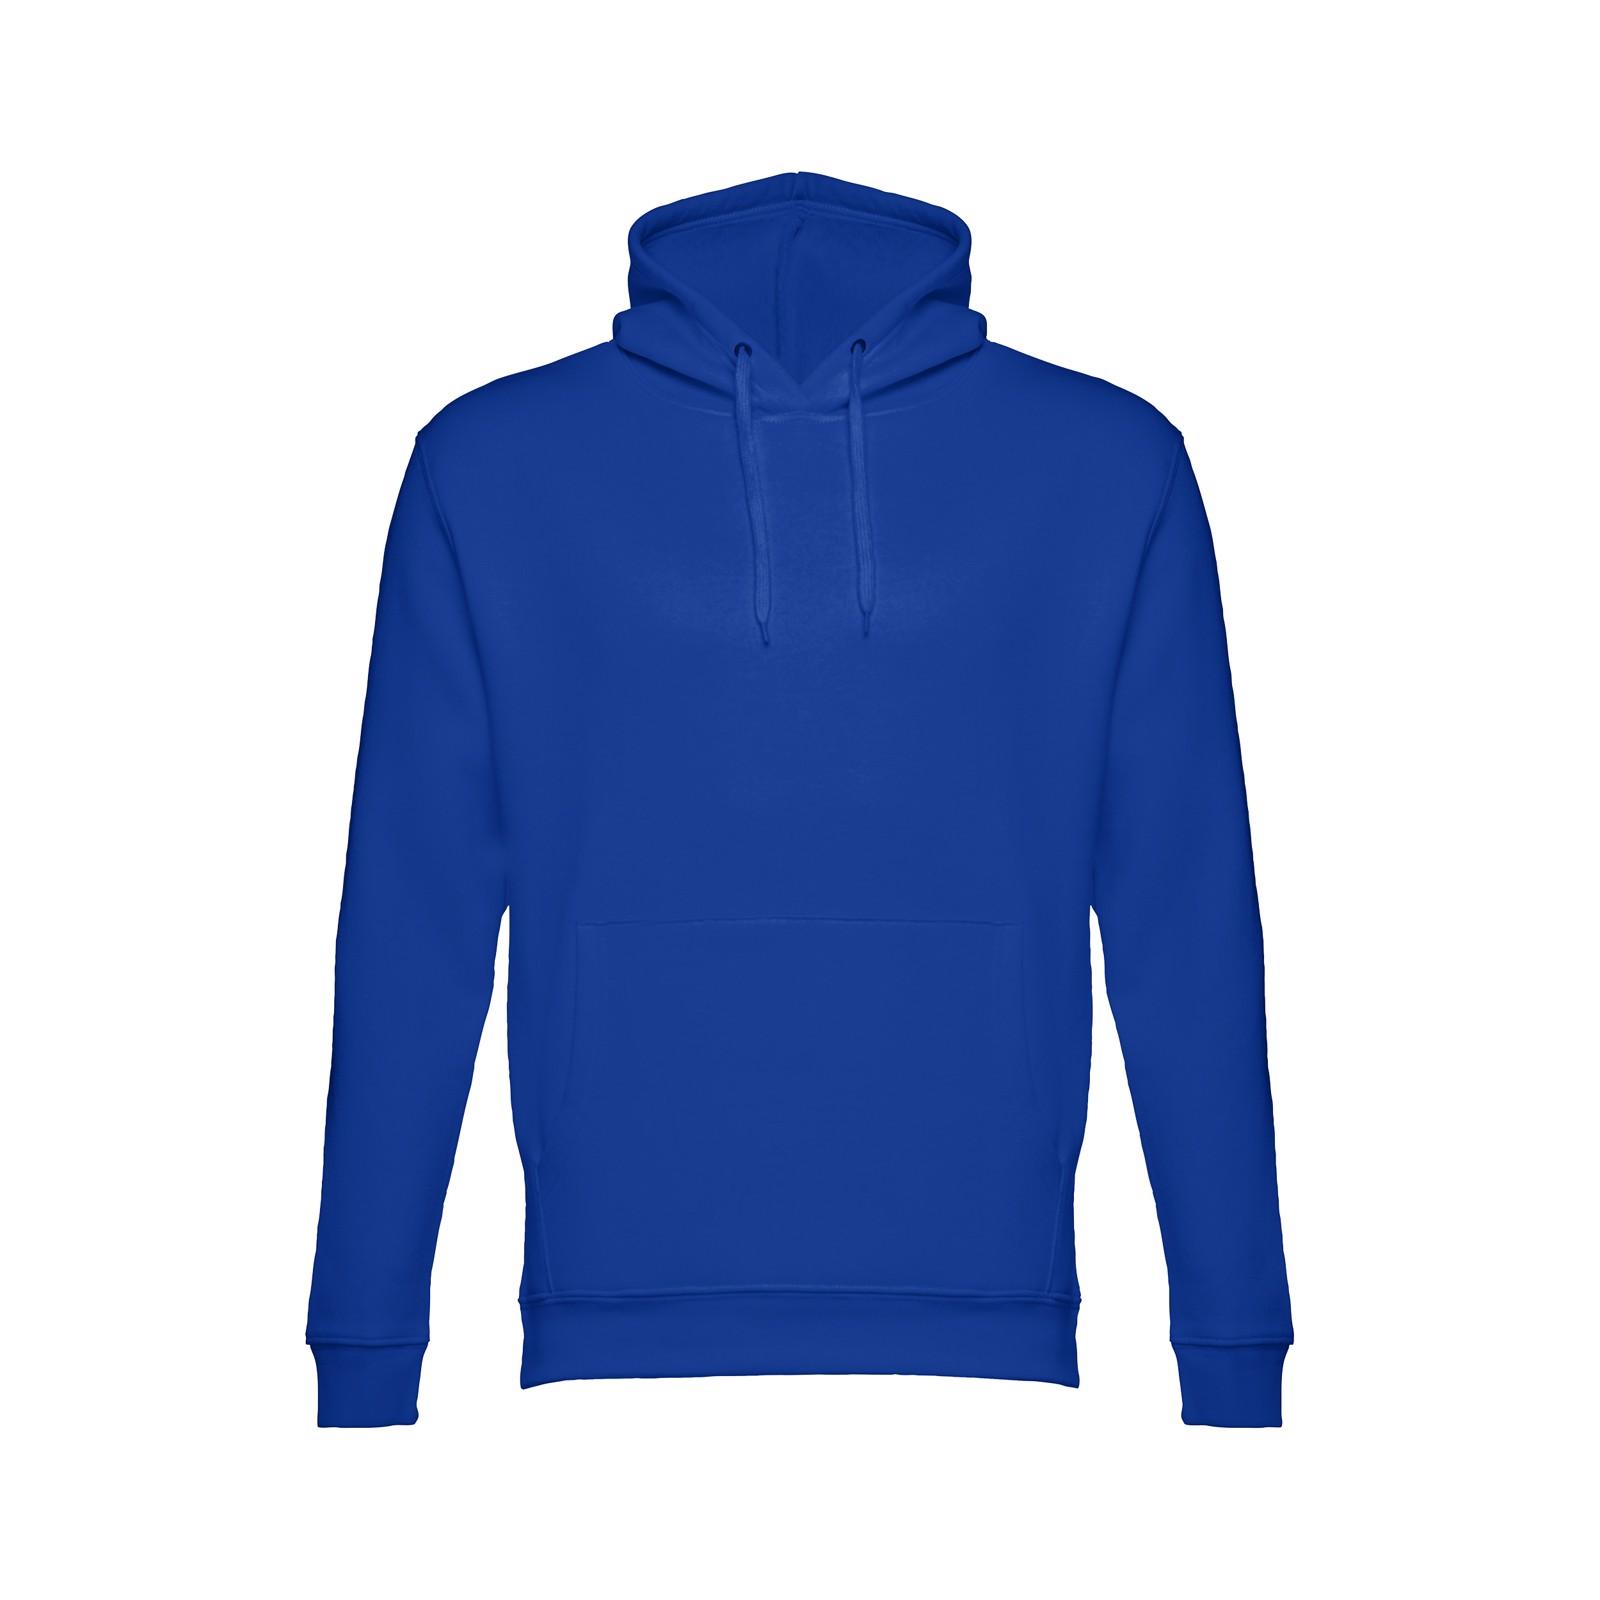 PHOENIX. Φούτερ με κουκούλα Unisex - Μπλε Ρουά / XS